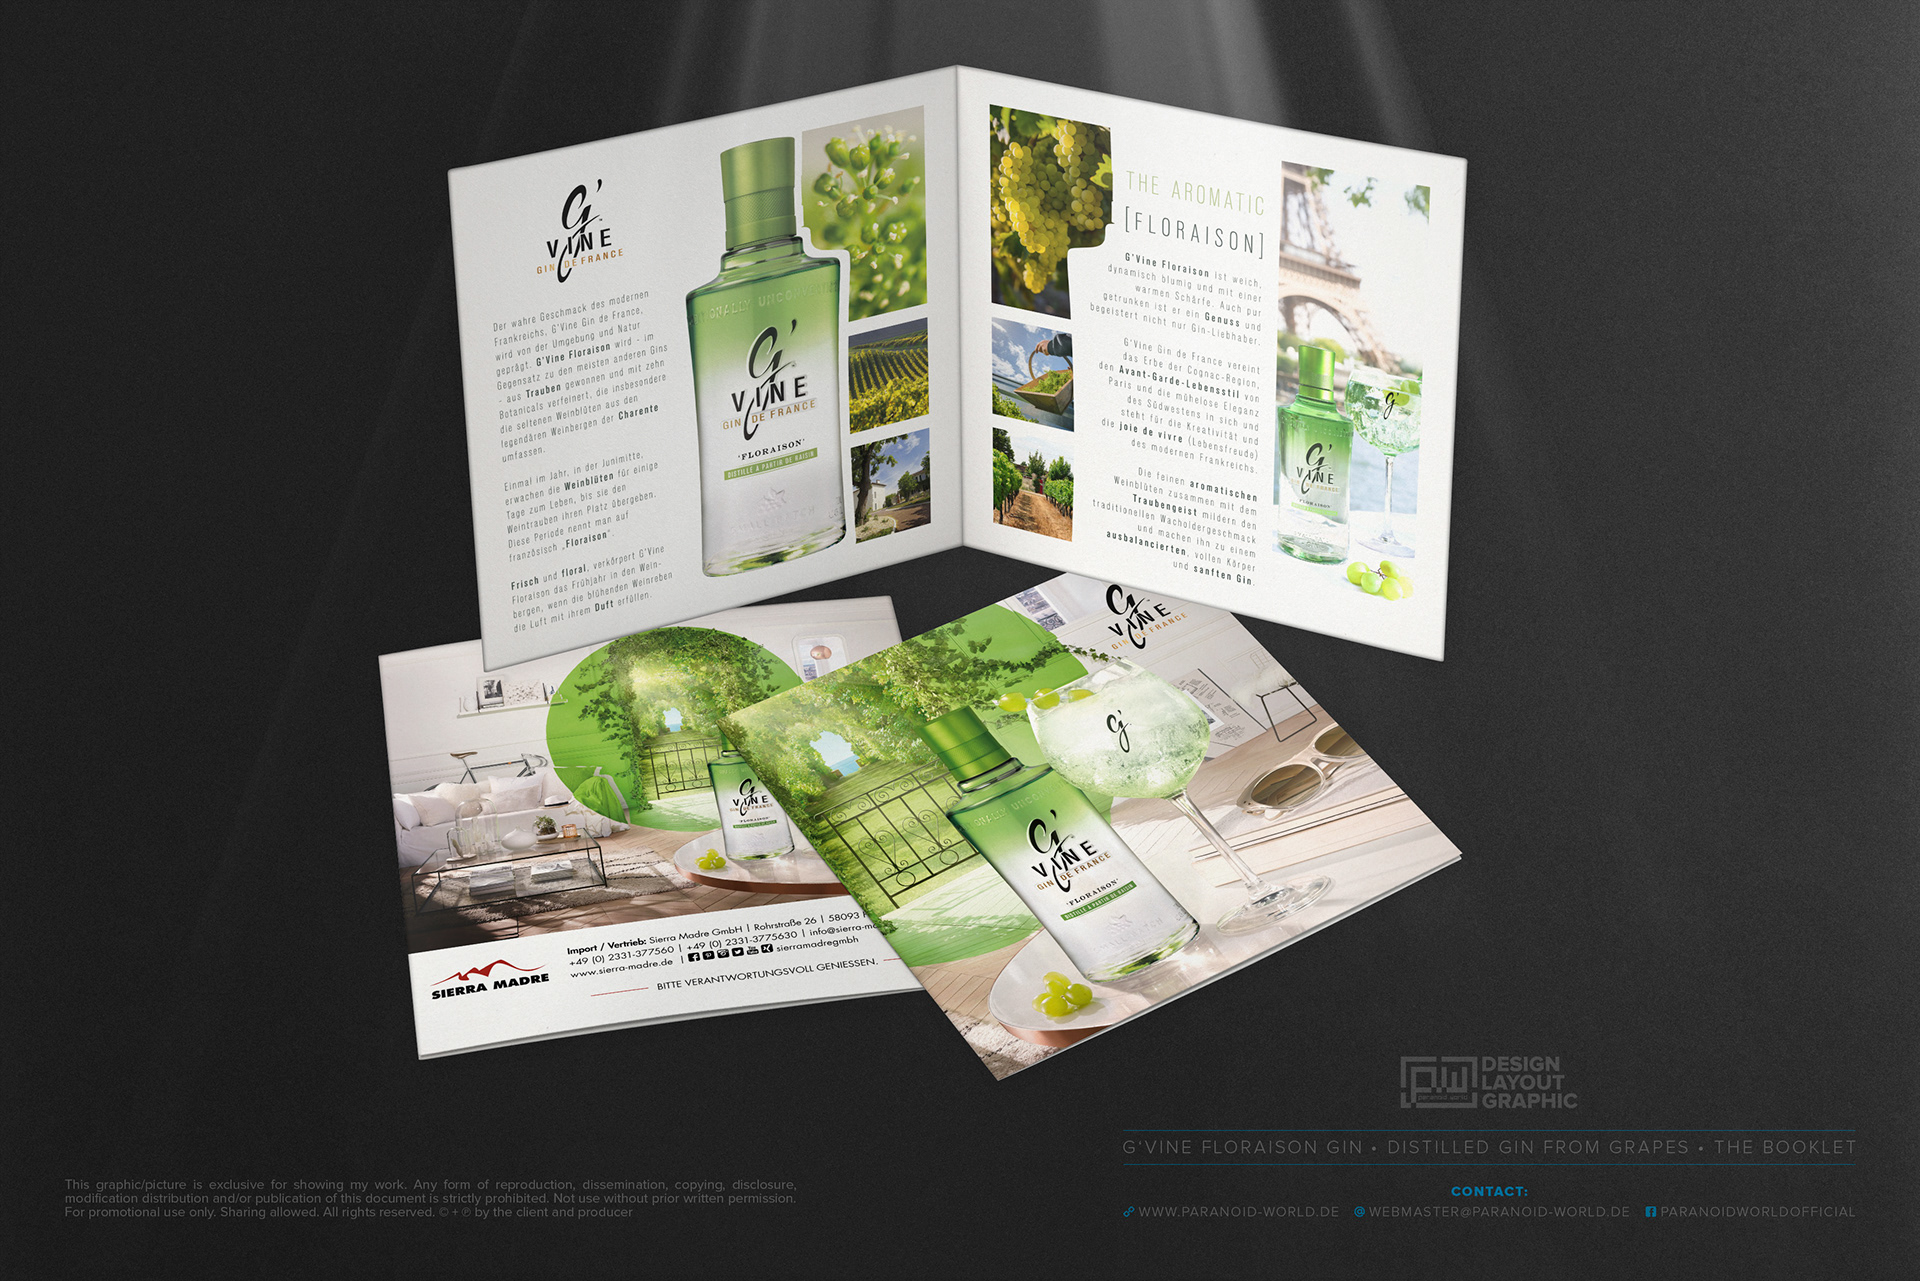 PARANOID WORLD | Design • Layout • Graphic - G\'VINE • Floraison ...